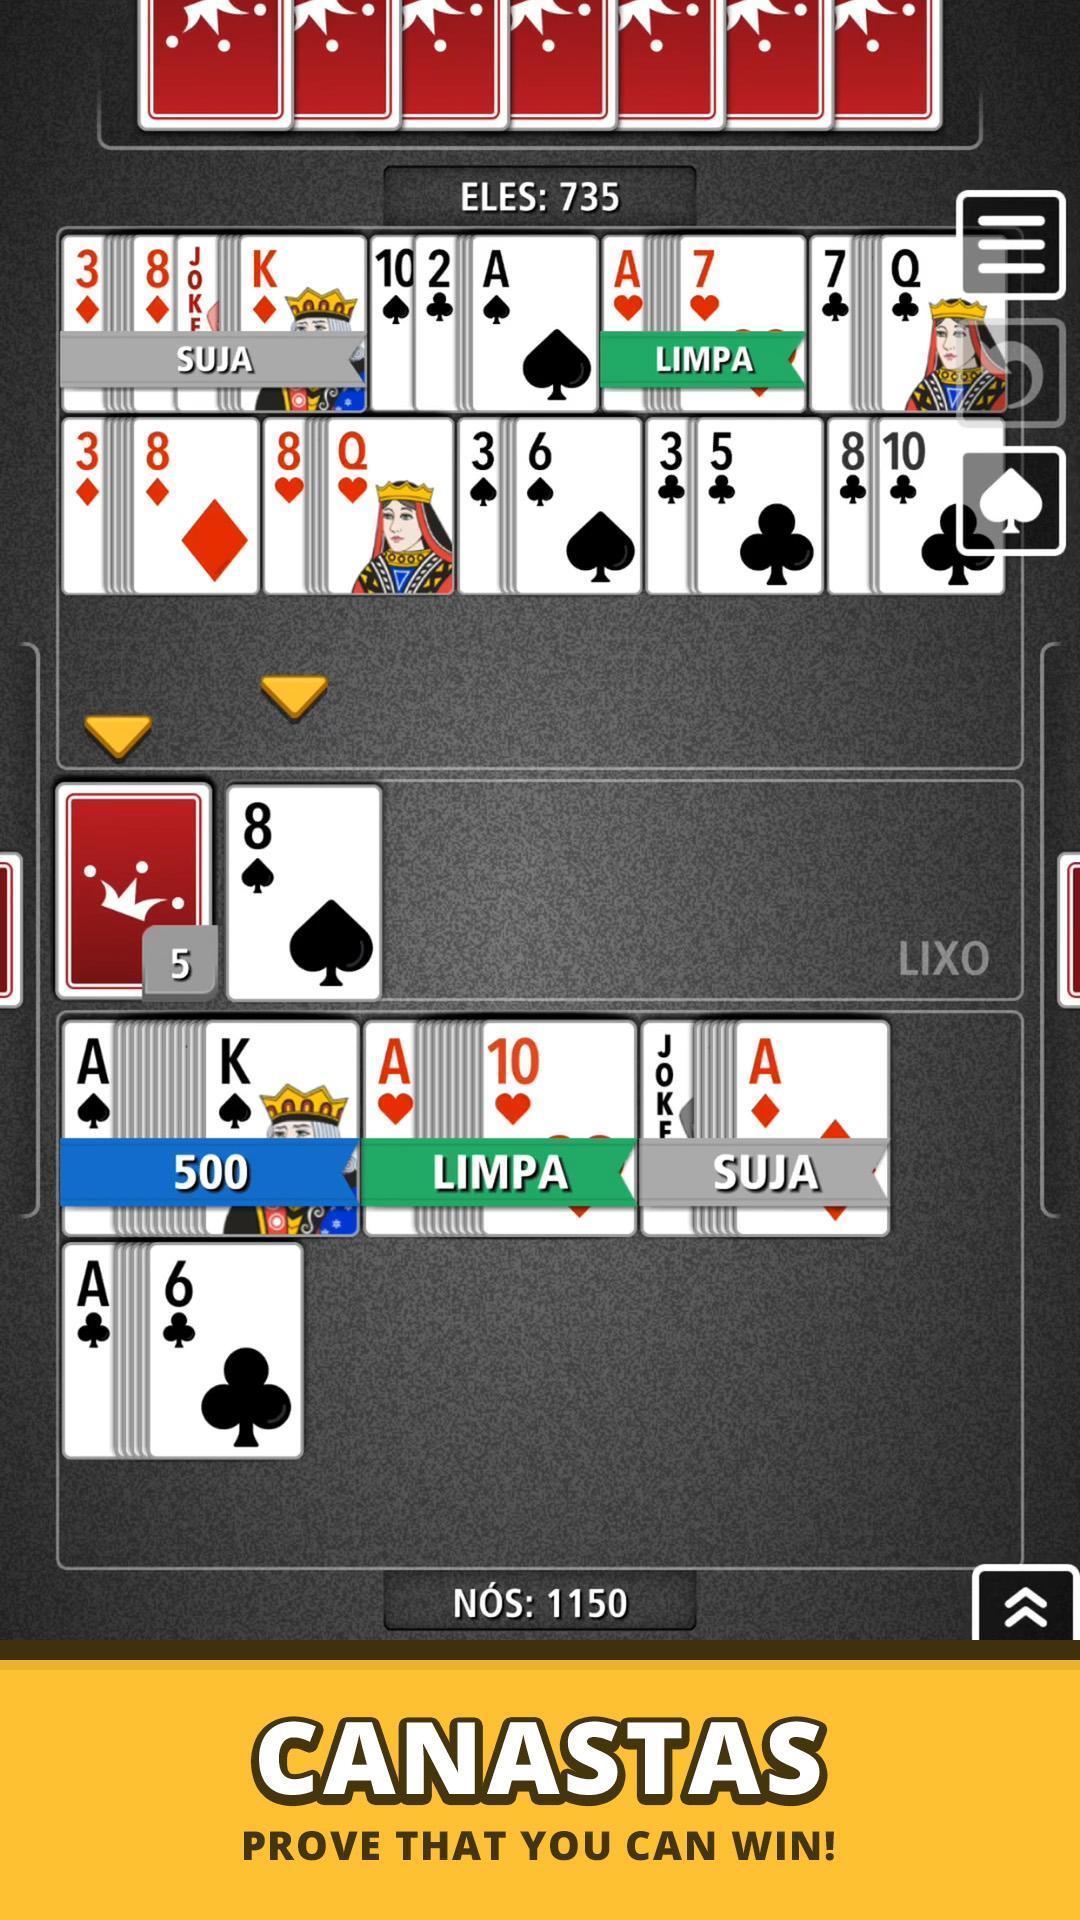 Buraco Canasta Jogatina: Card Games For Free 4.0.2 Screenshot 7